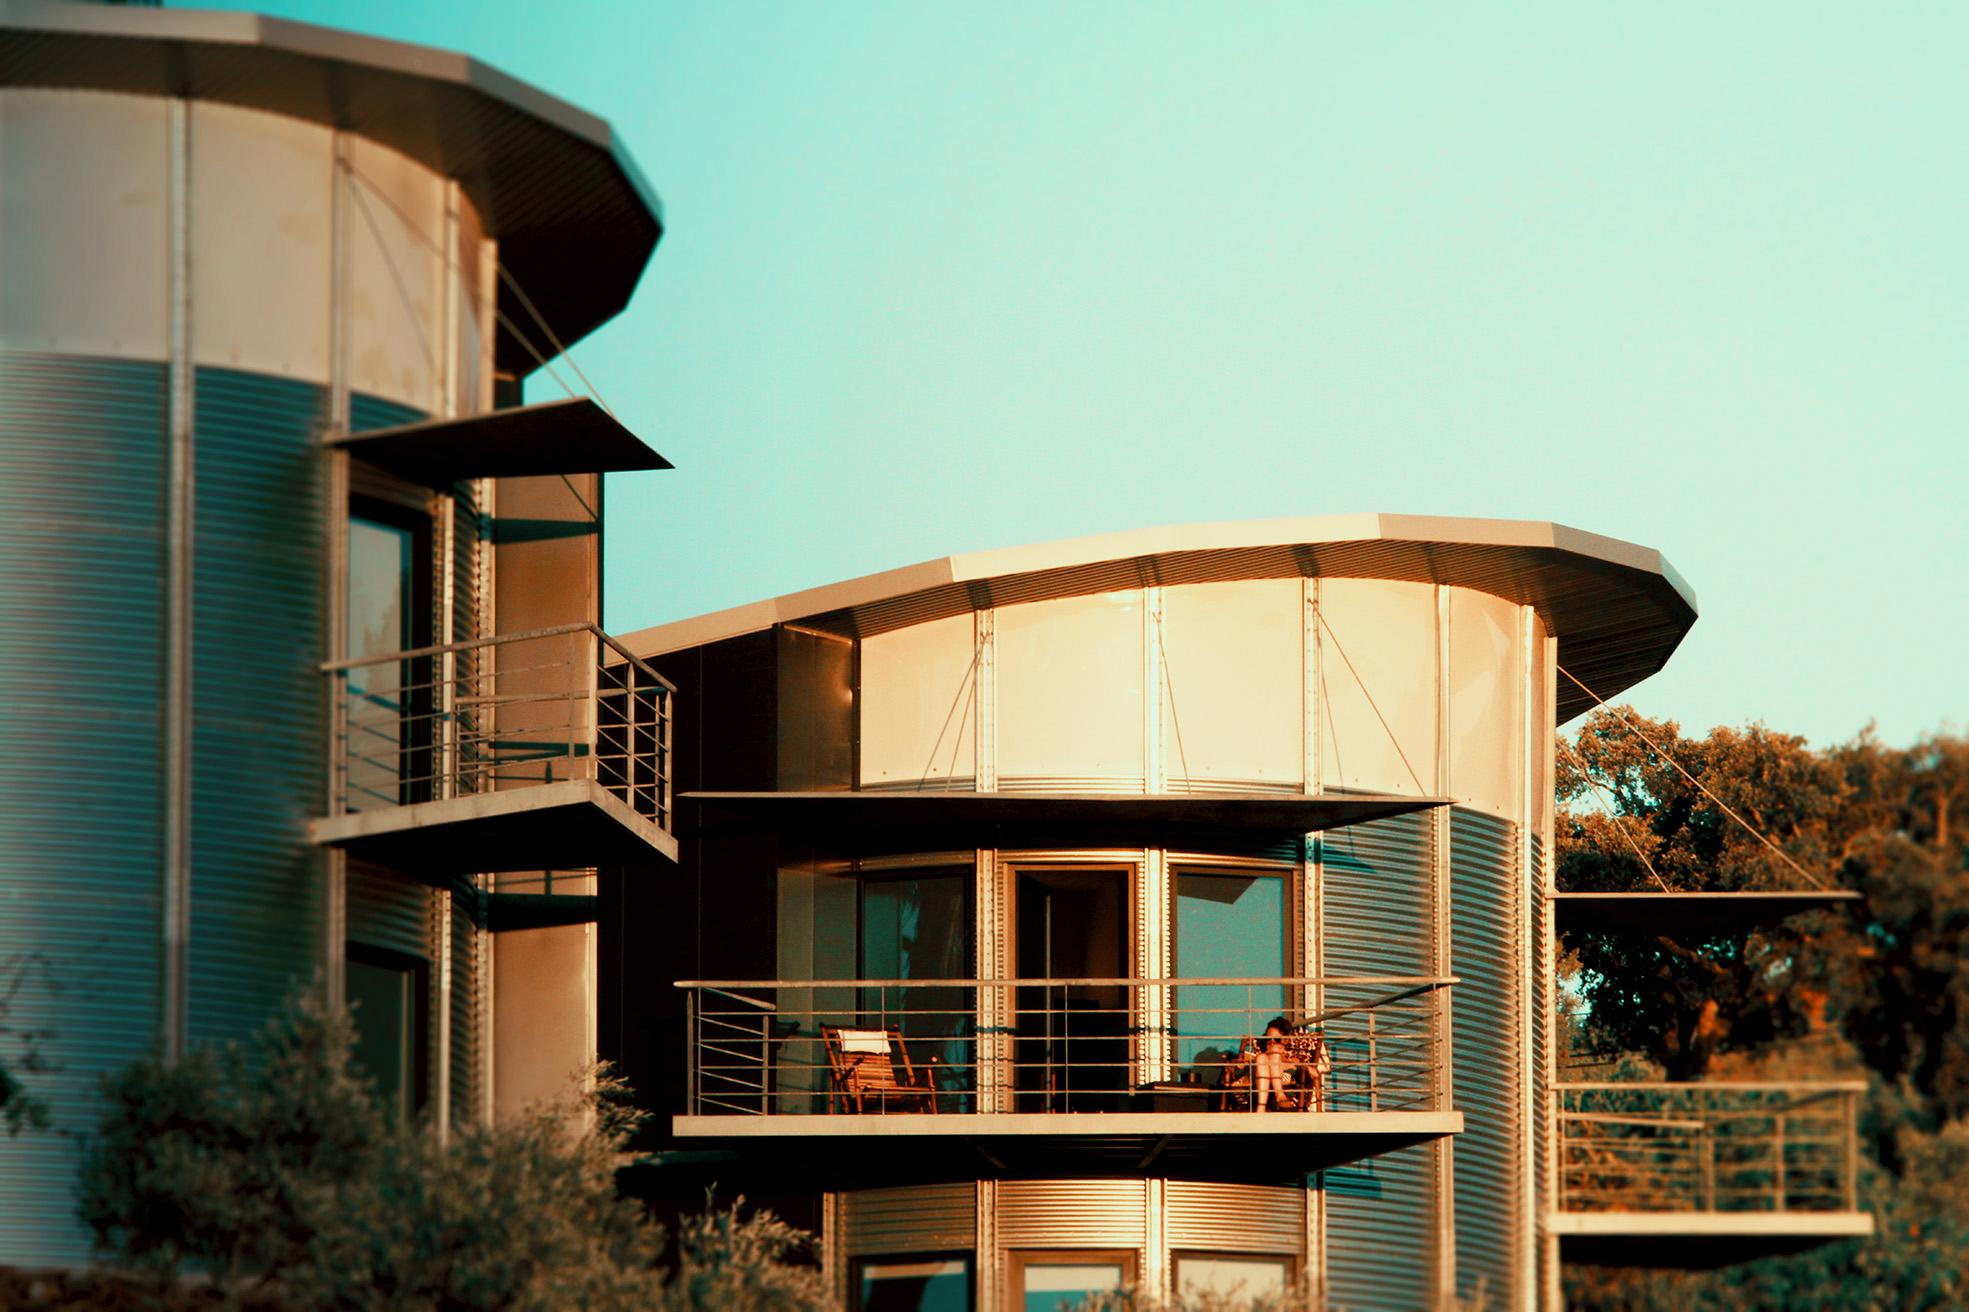 Bela Vista Silo Housing